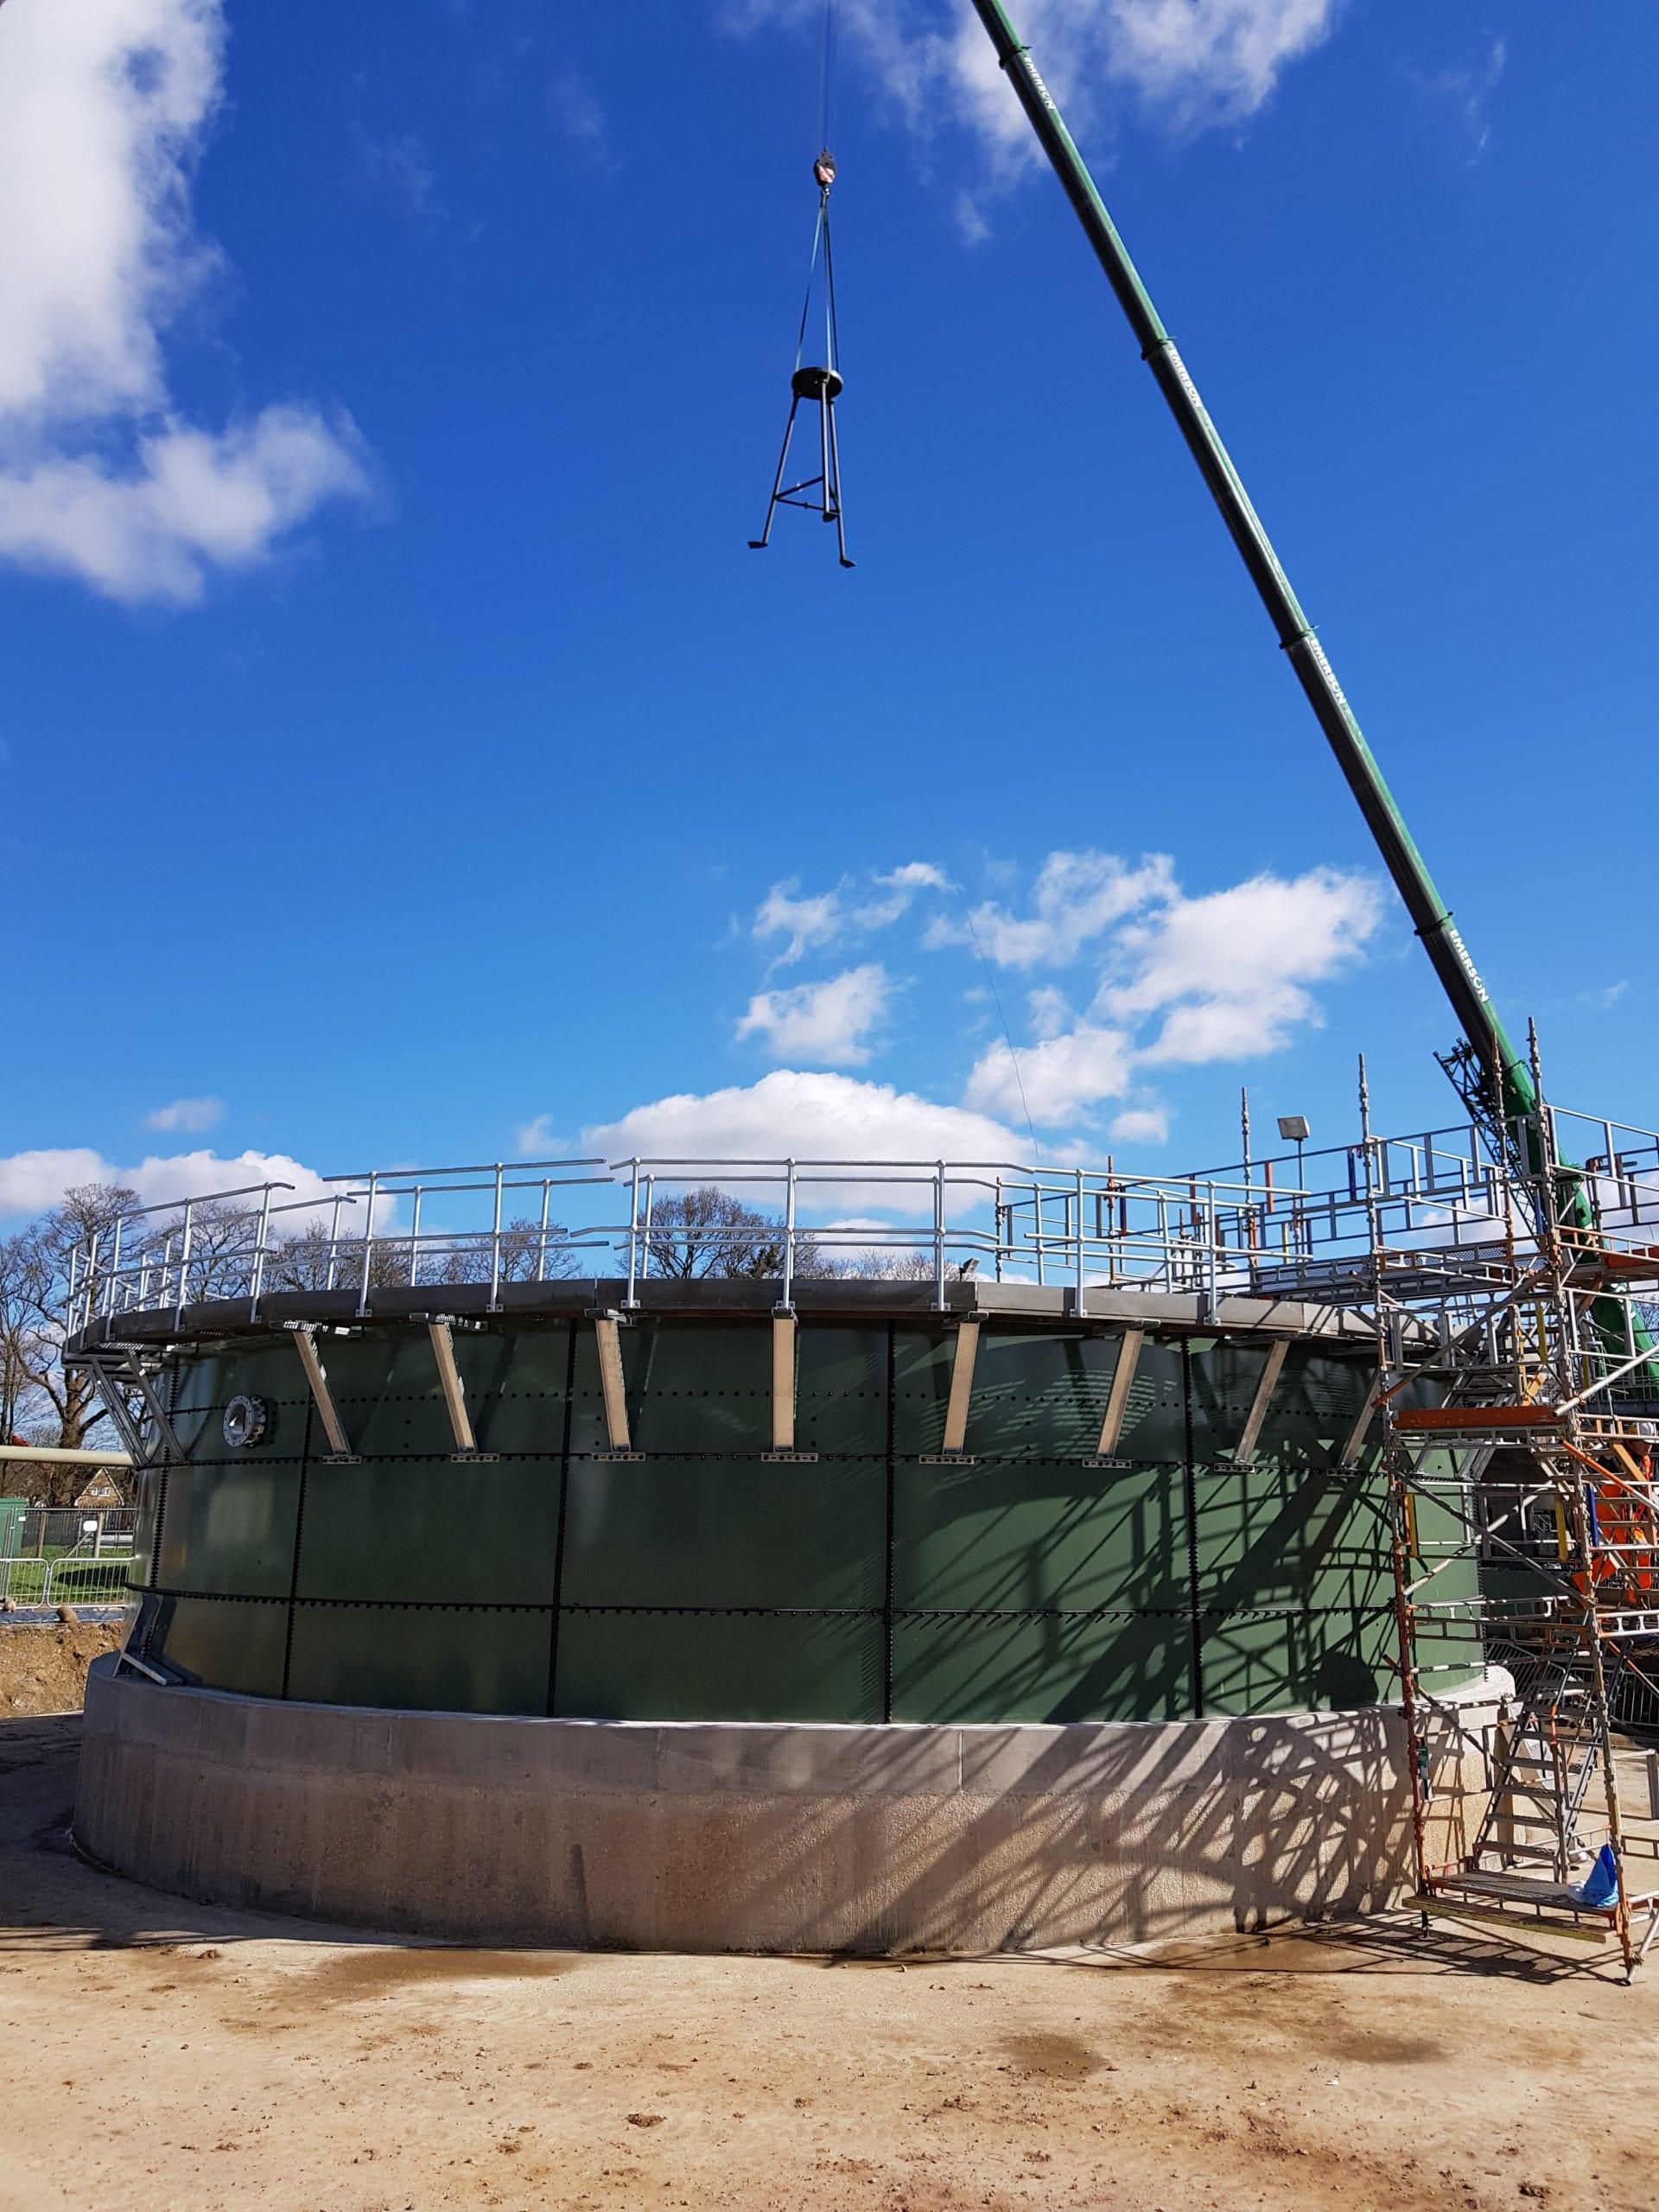 Horley Waste Water Treatment Works (WwTW) Image